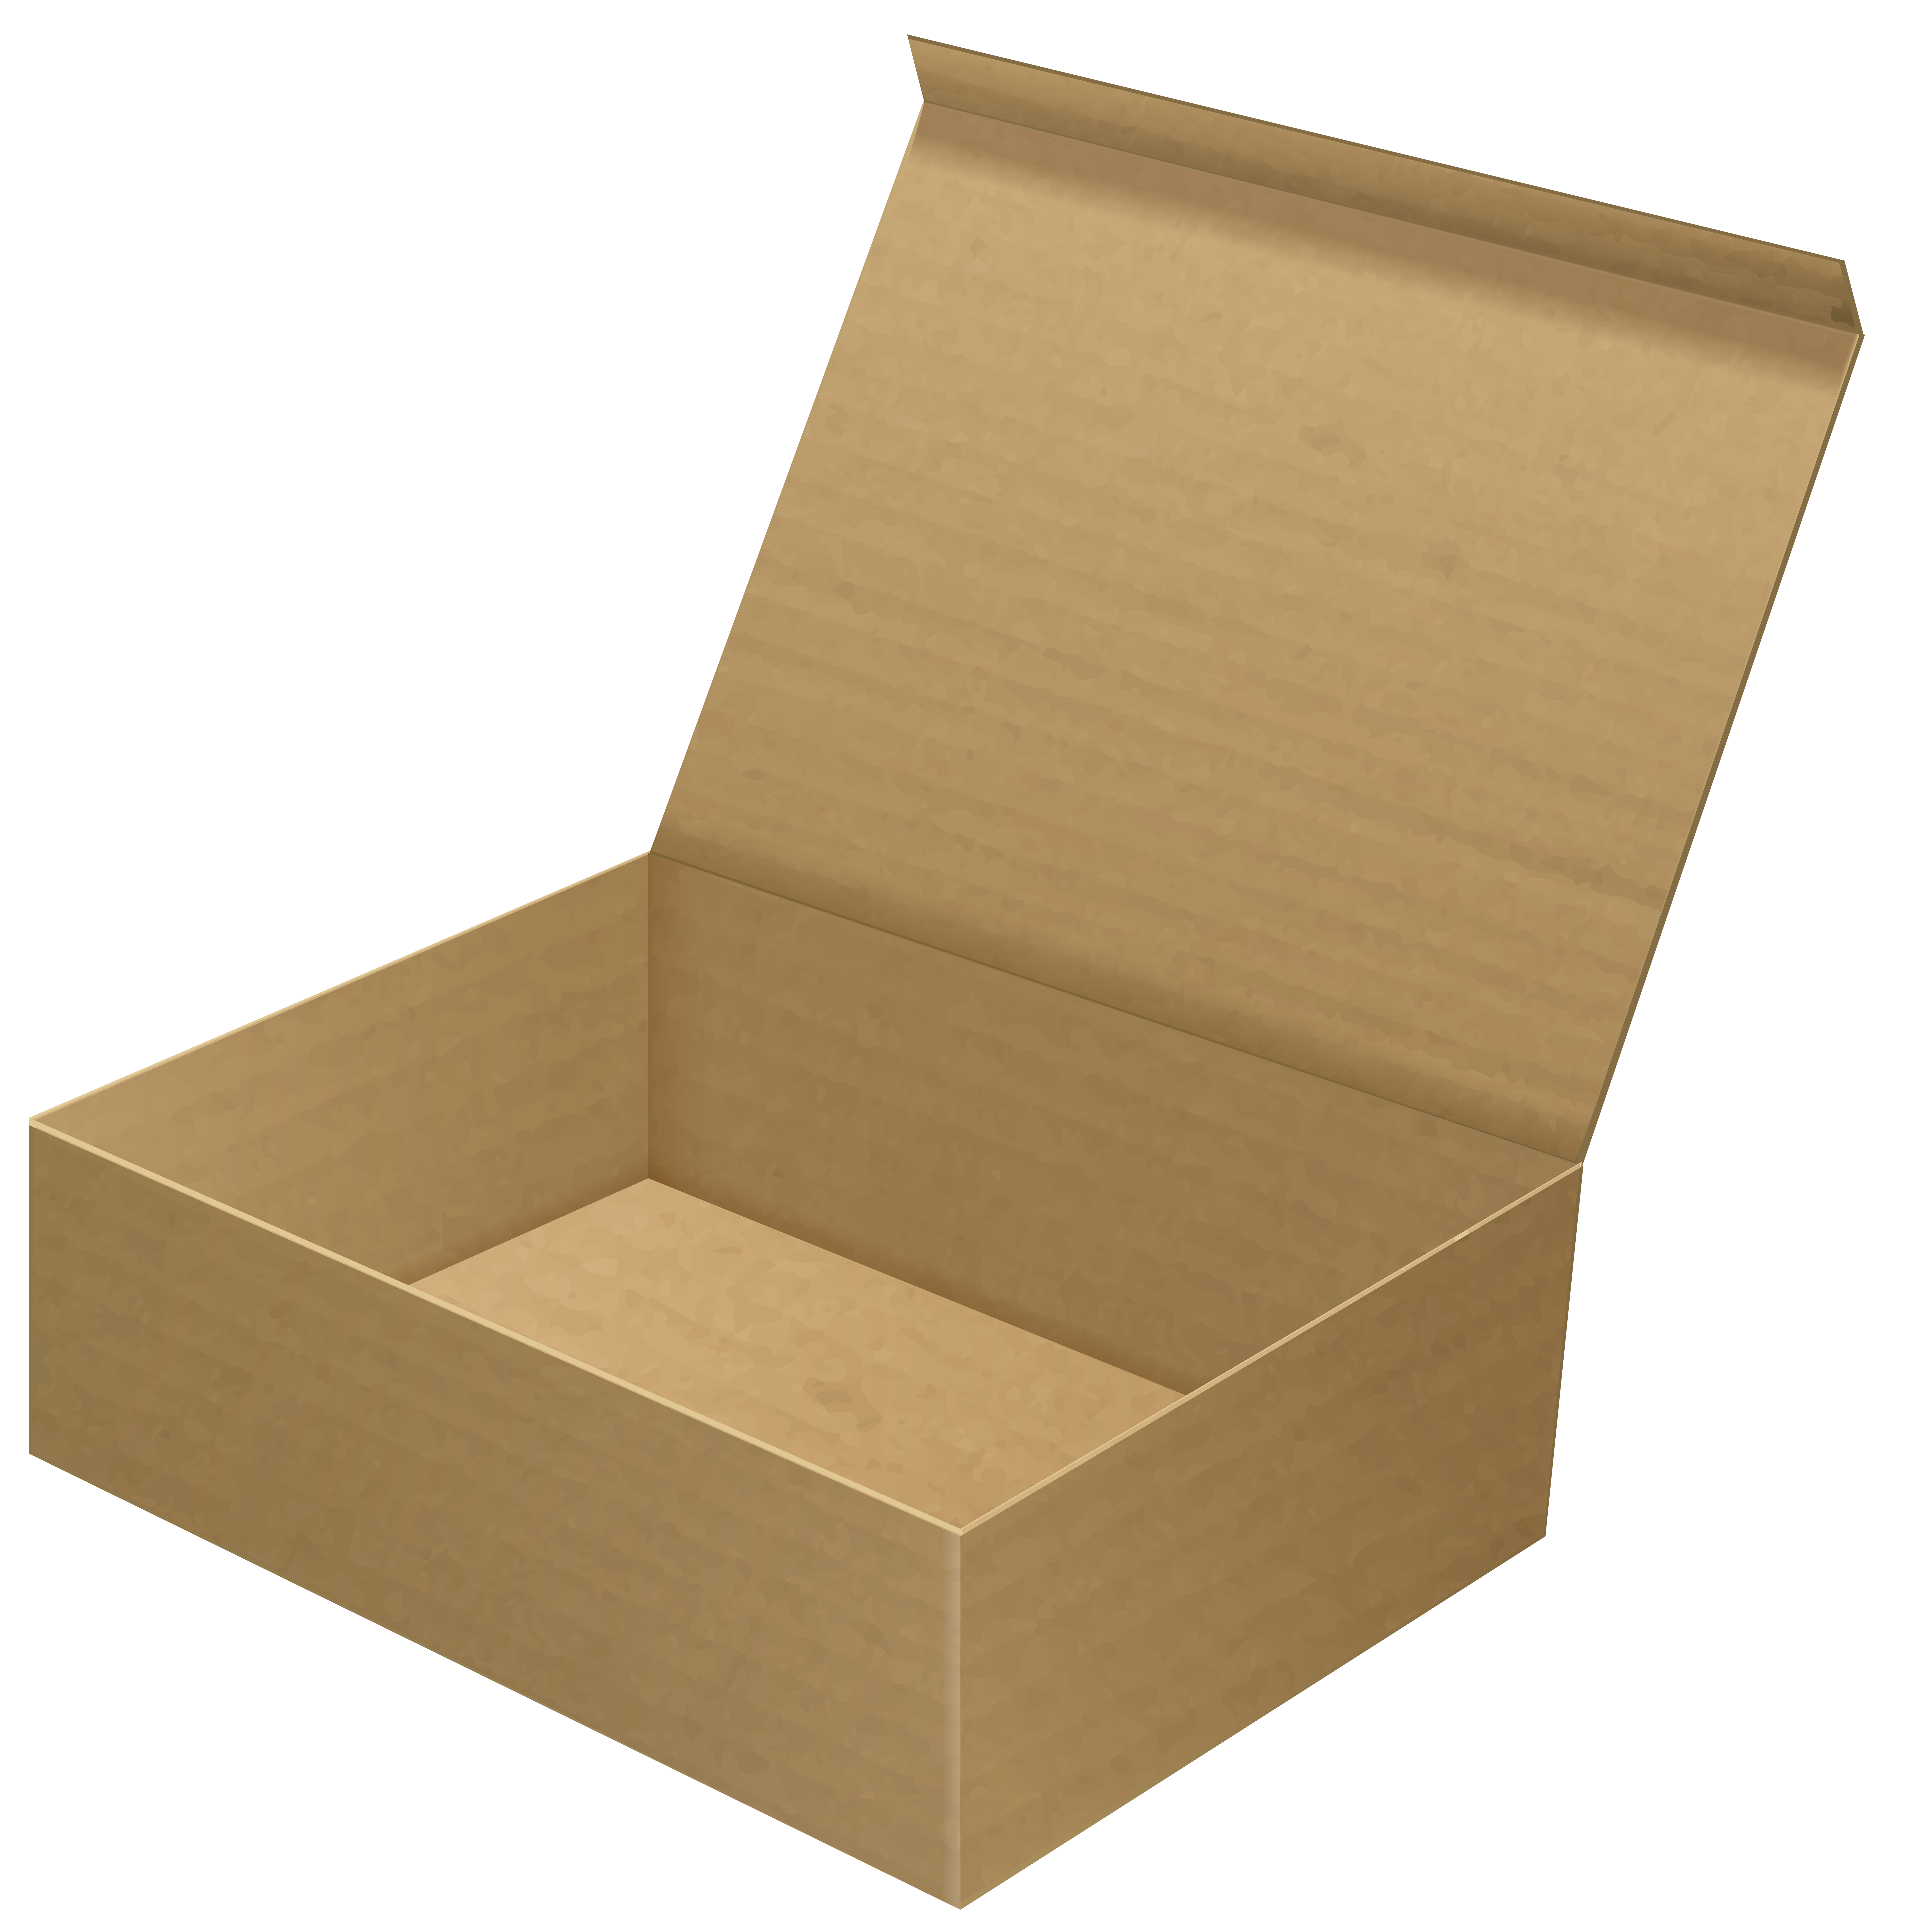 Open Cardboard Box Clip Art PNG Image.